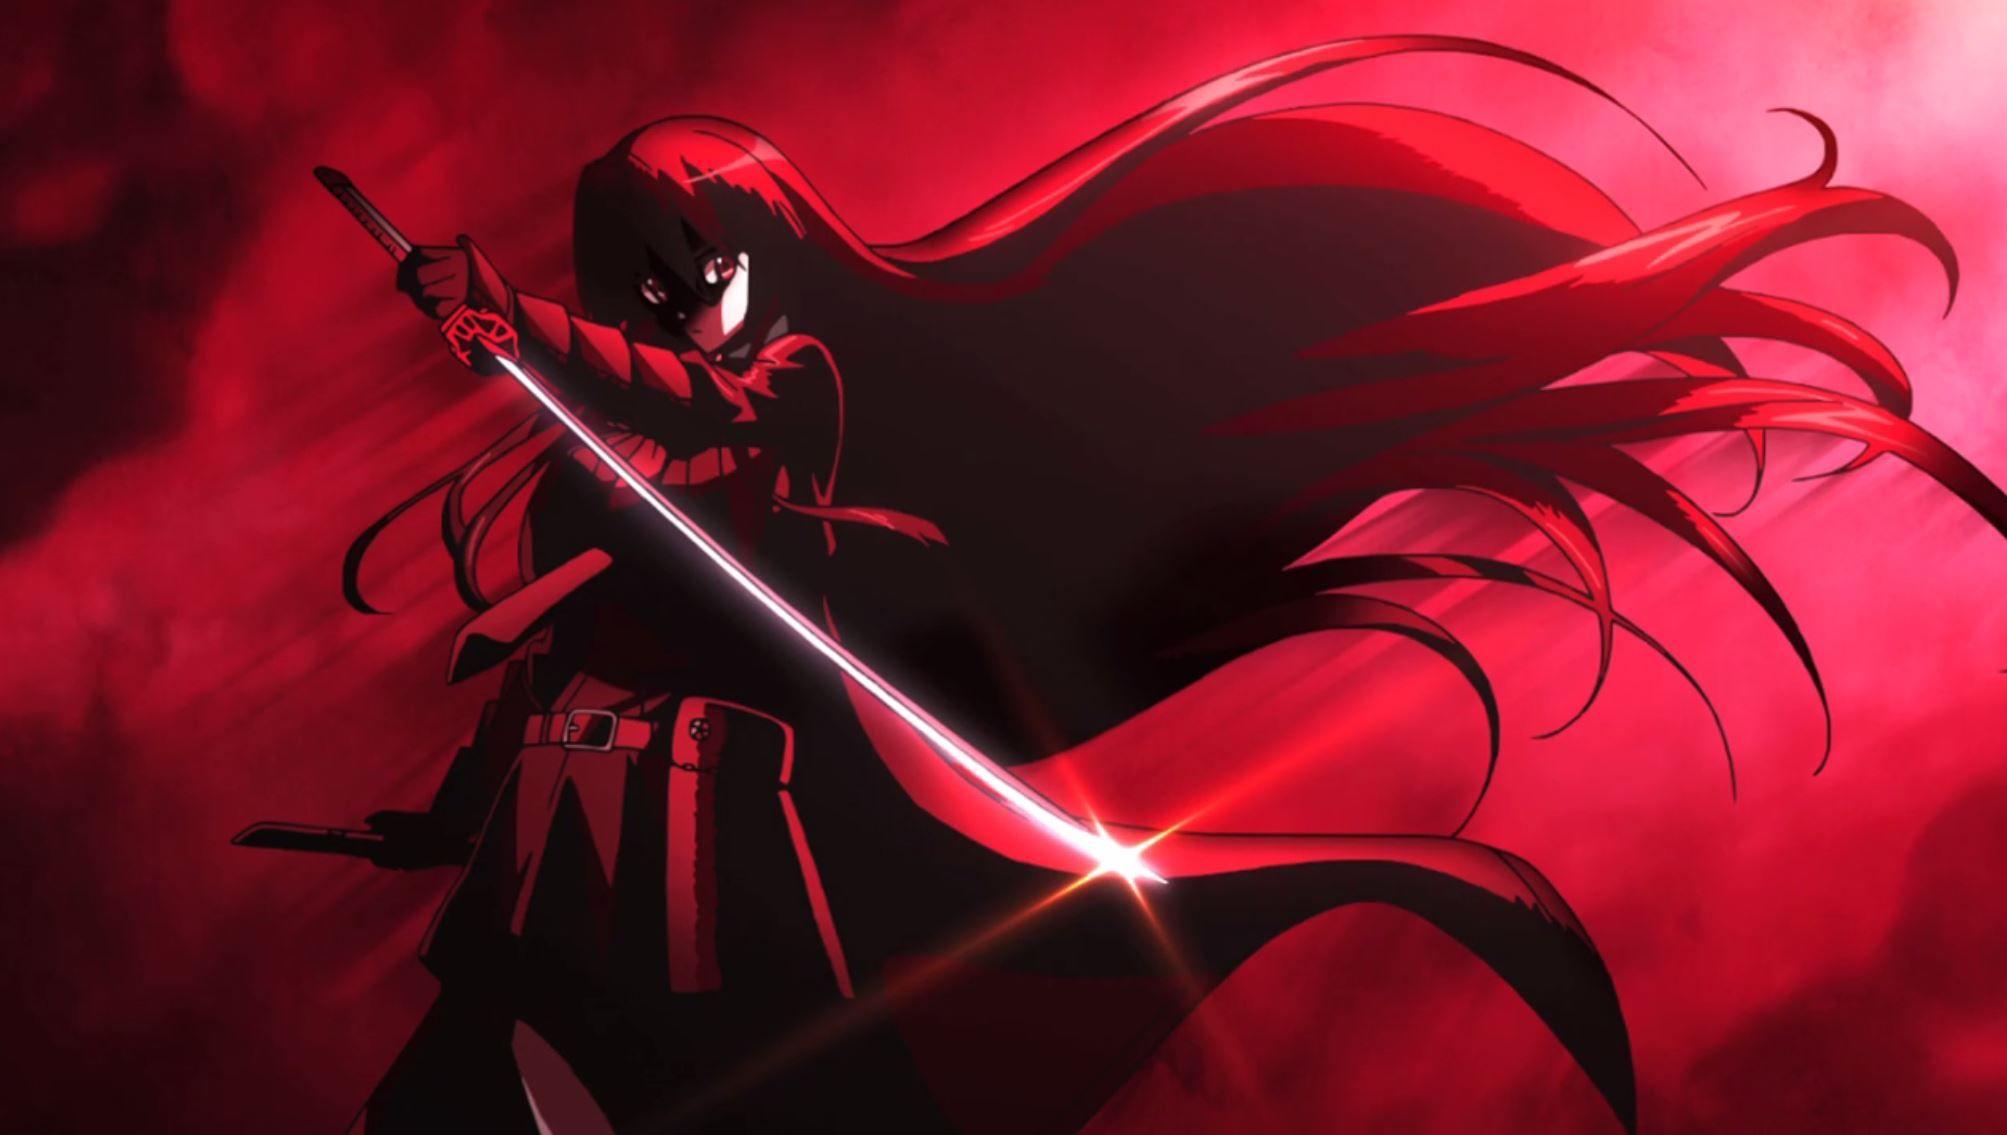 Anime Round Up Akame Ga Kill Nobunaga Concerto No Game No Life Kill La Kill Akame Ga Kill Akame Ga Anime Wallpaper